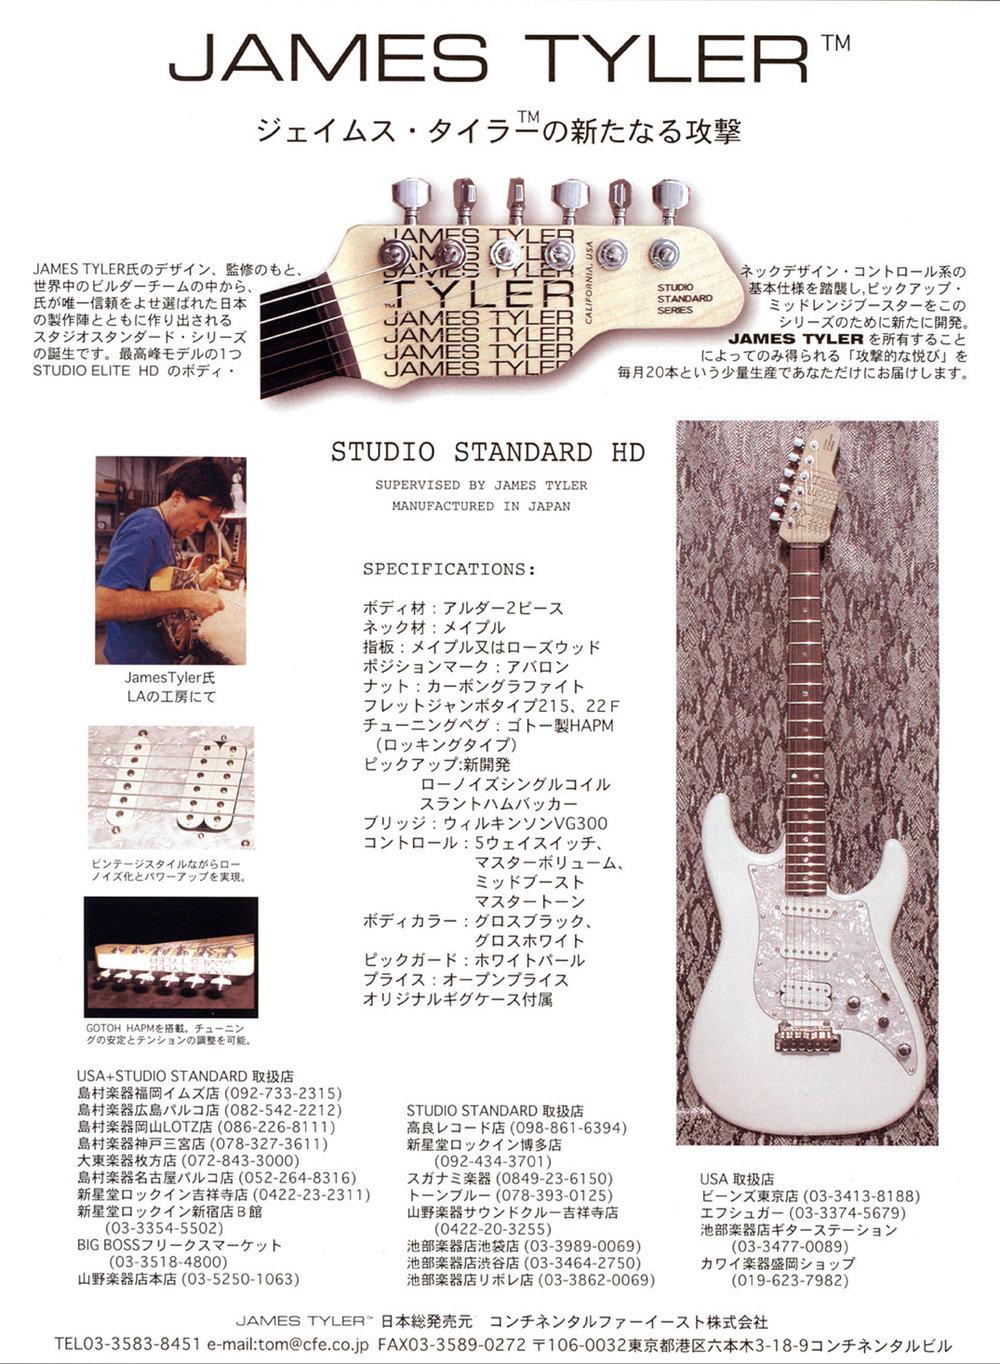 2002 Guitar Magazine